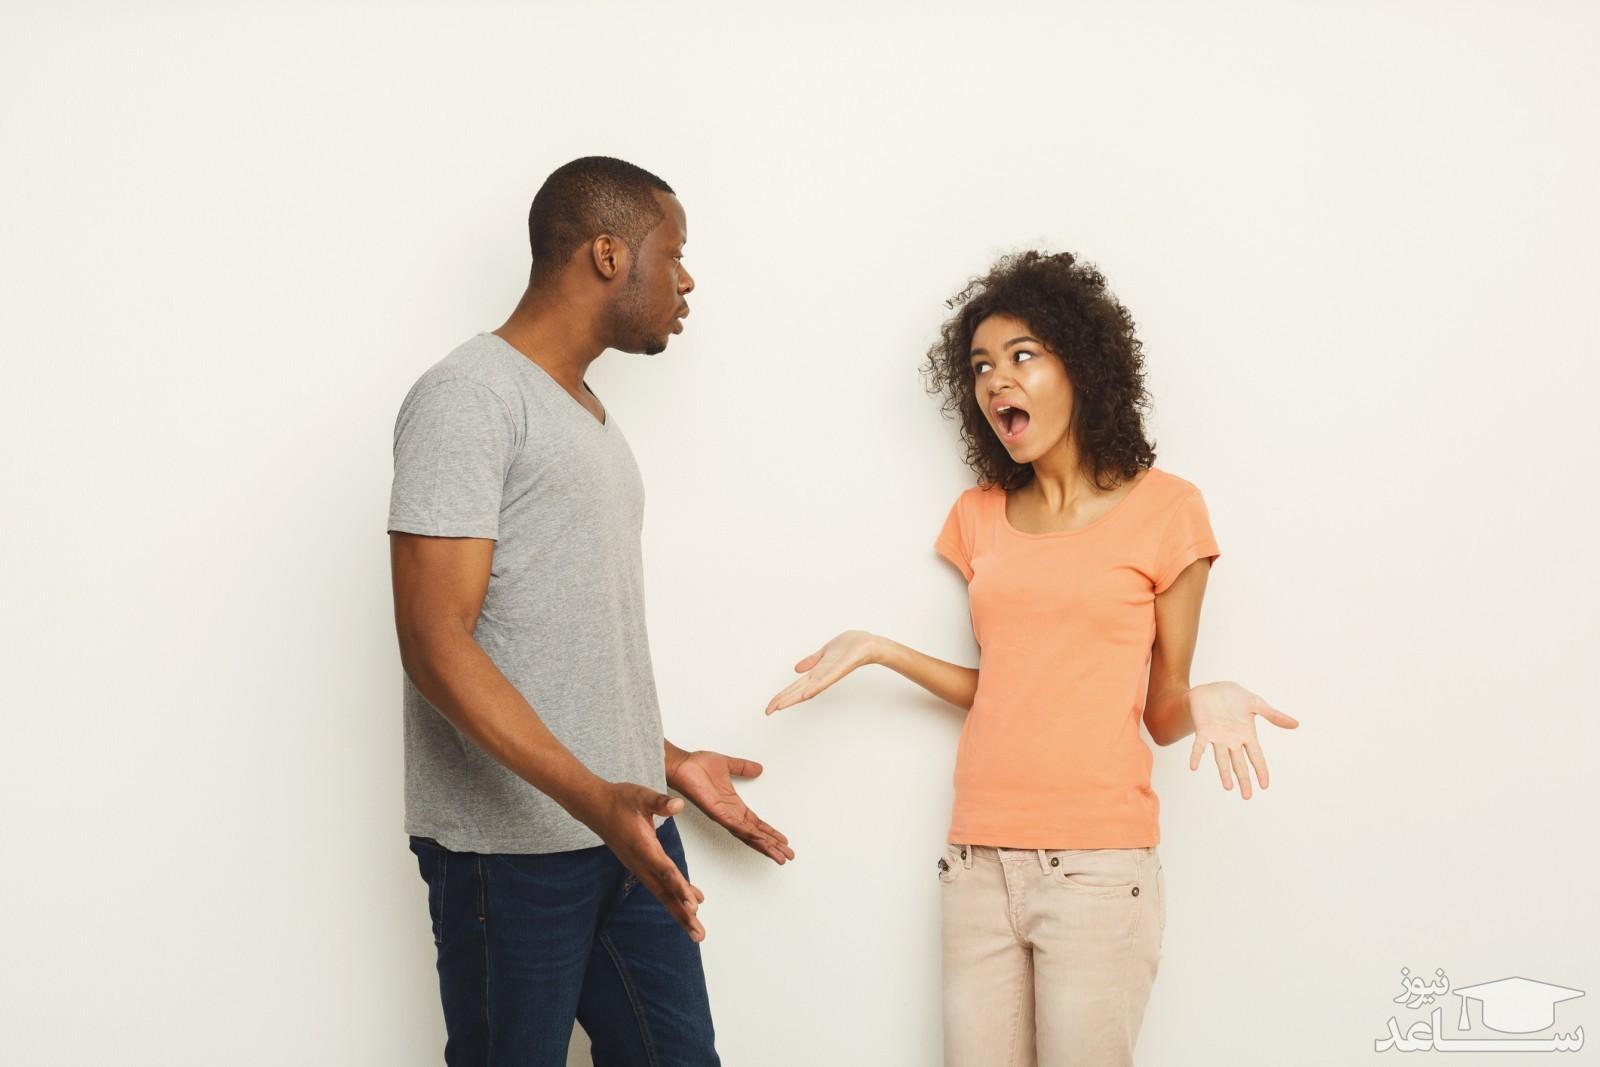 اصول جروبحث کردن با همسر